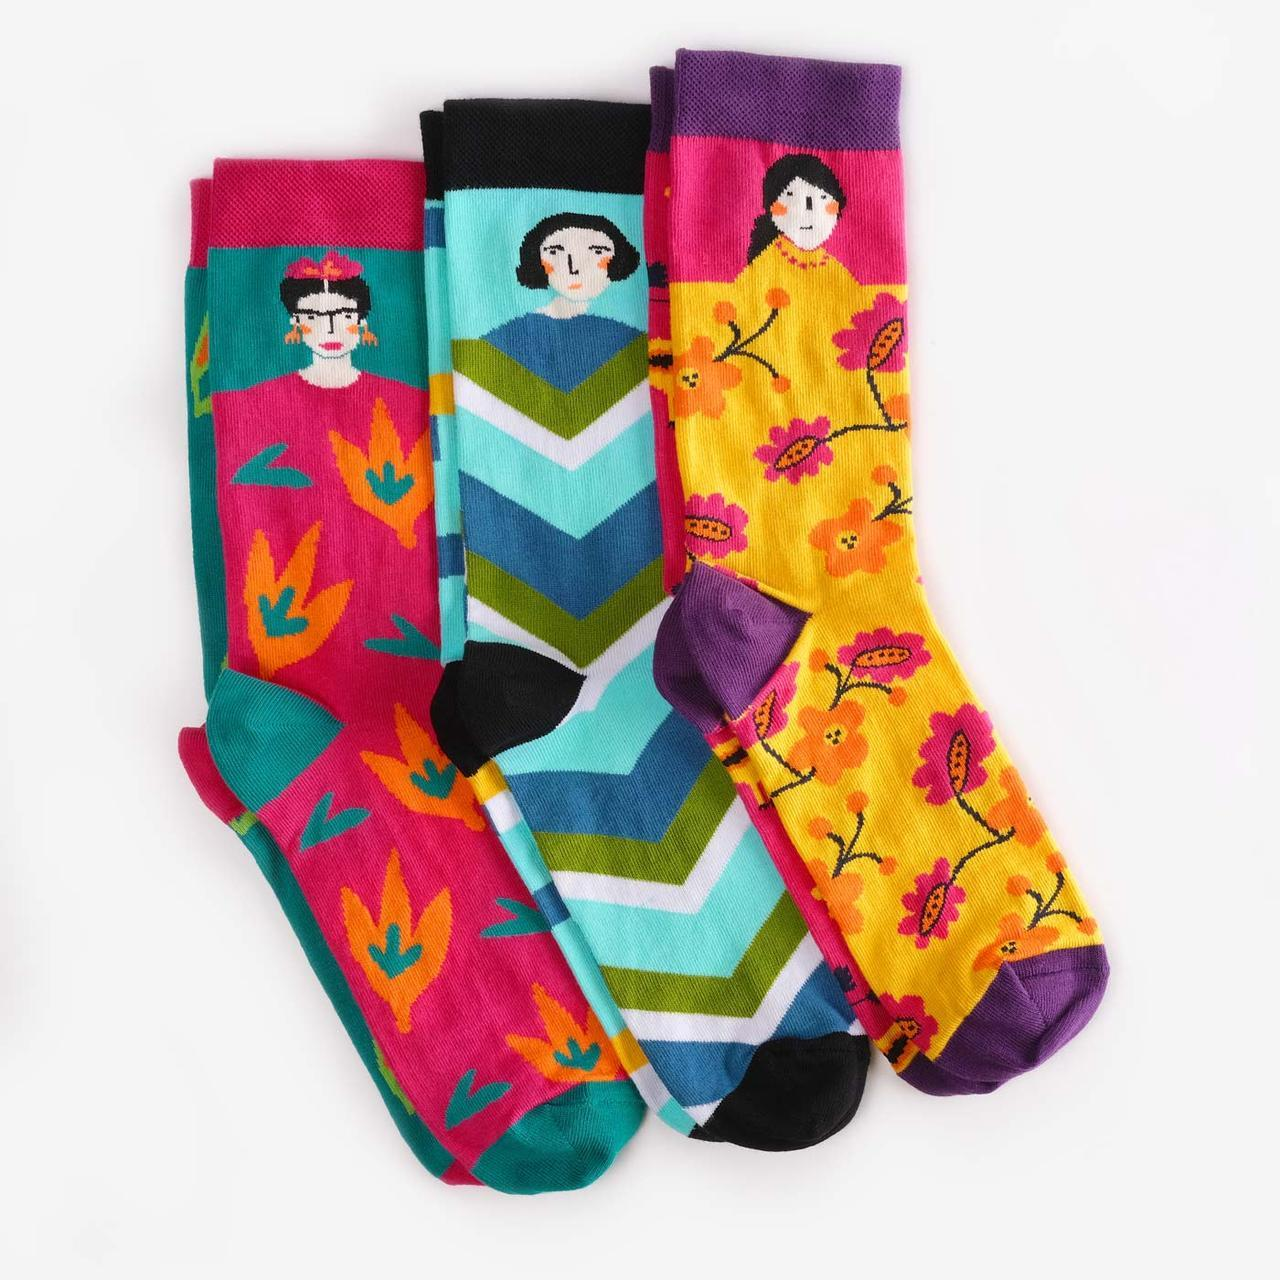 Носки Dodo Socks набор Artista 36-38, 3 шт